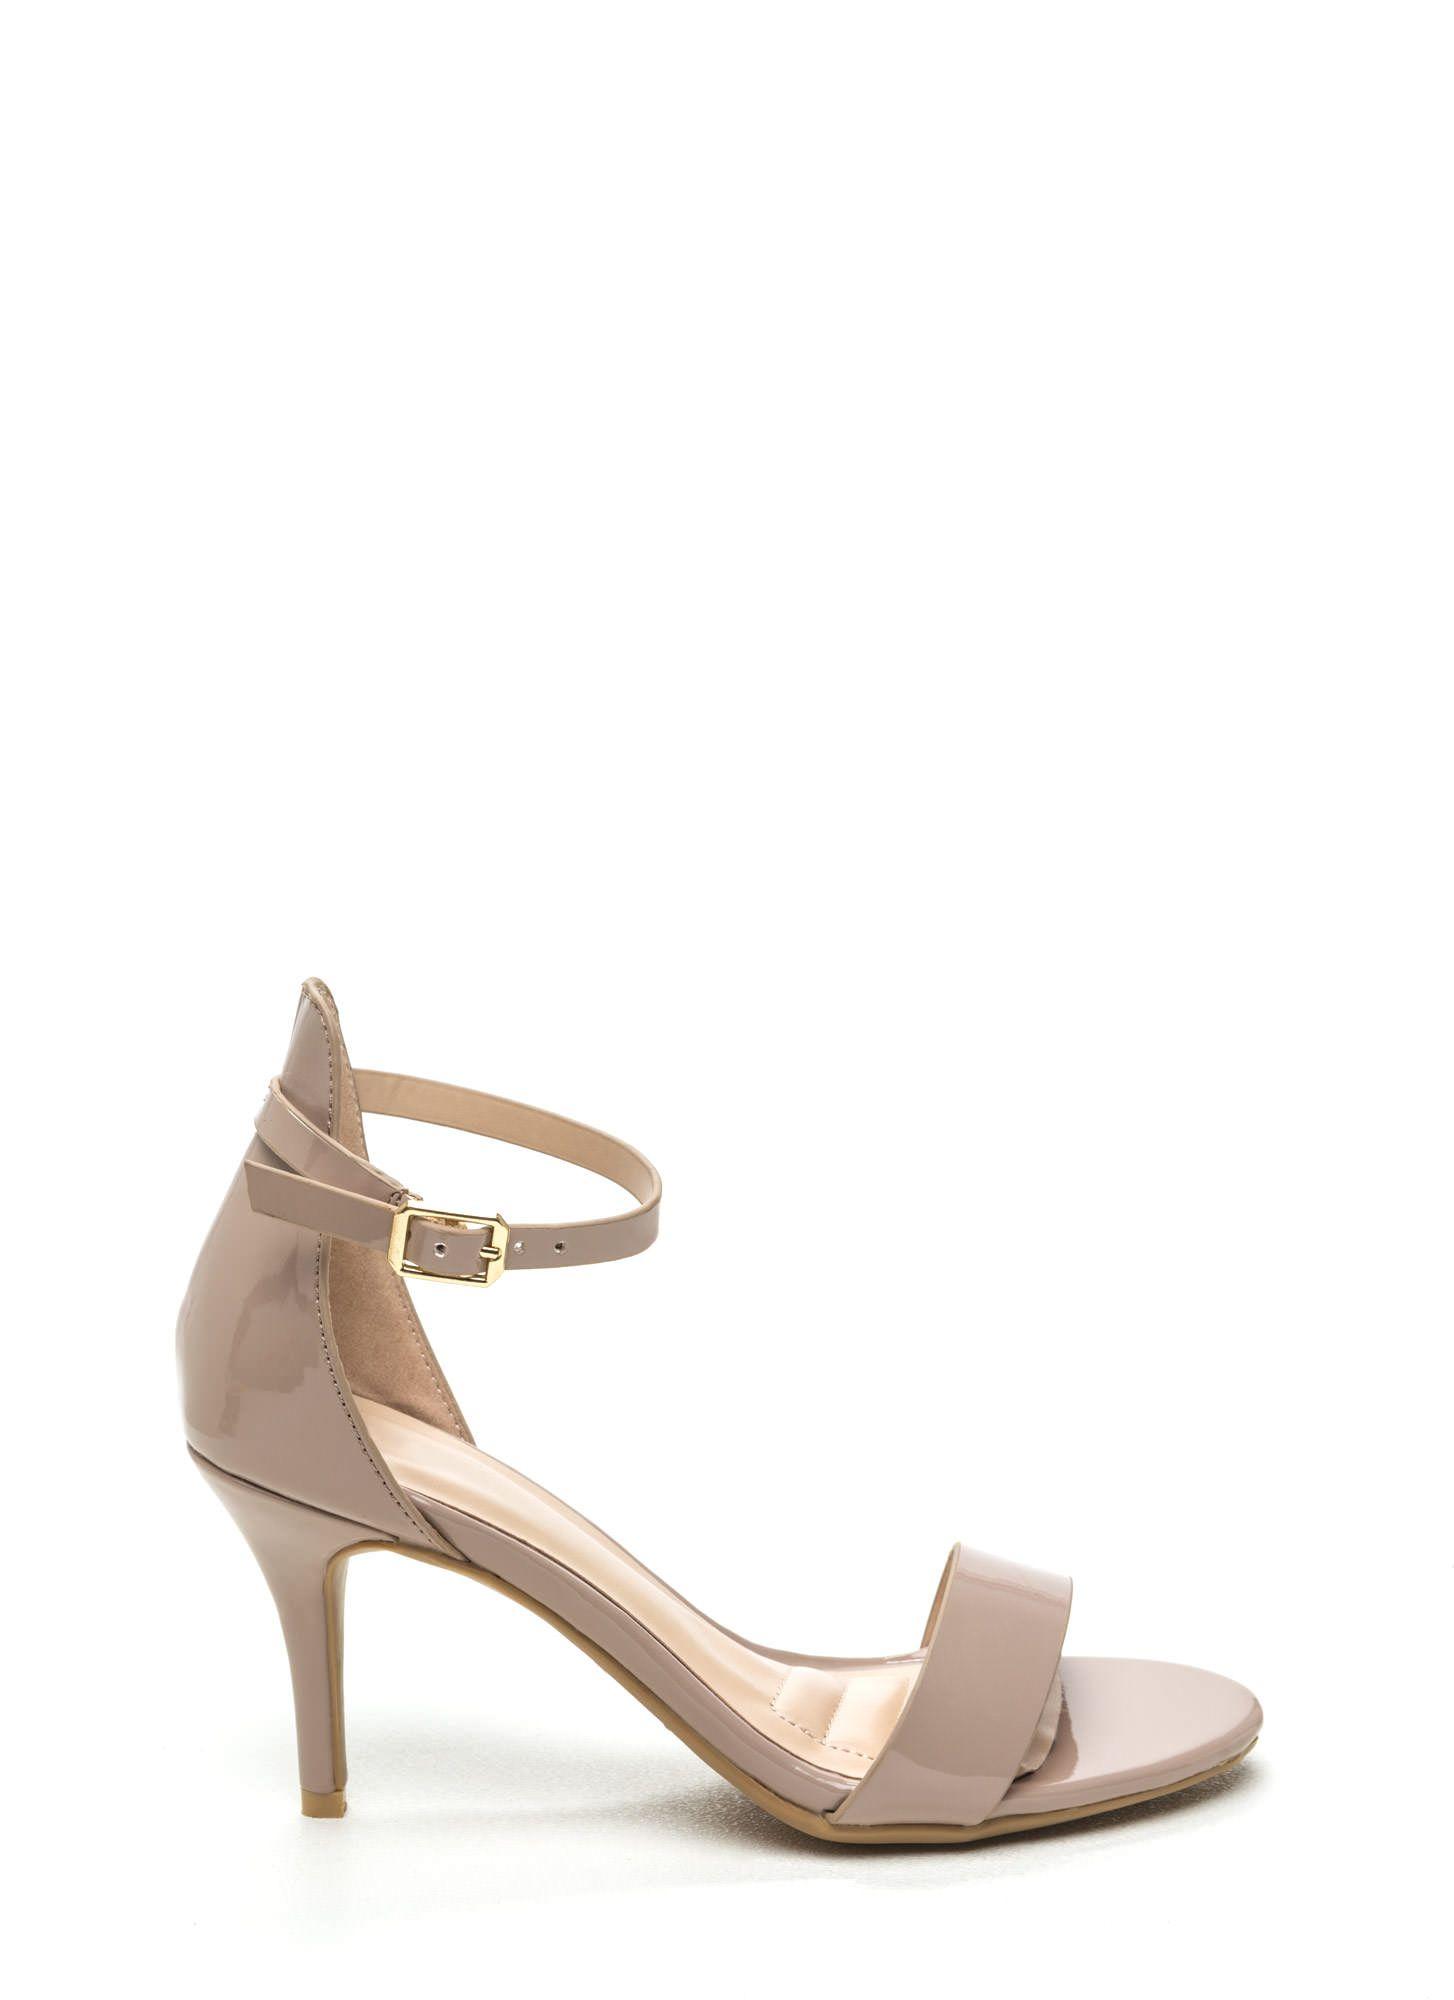 Come Up Short Shiny Strappy Heels BLACK NUDE - GoJane.com ...